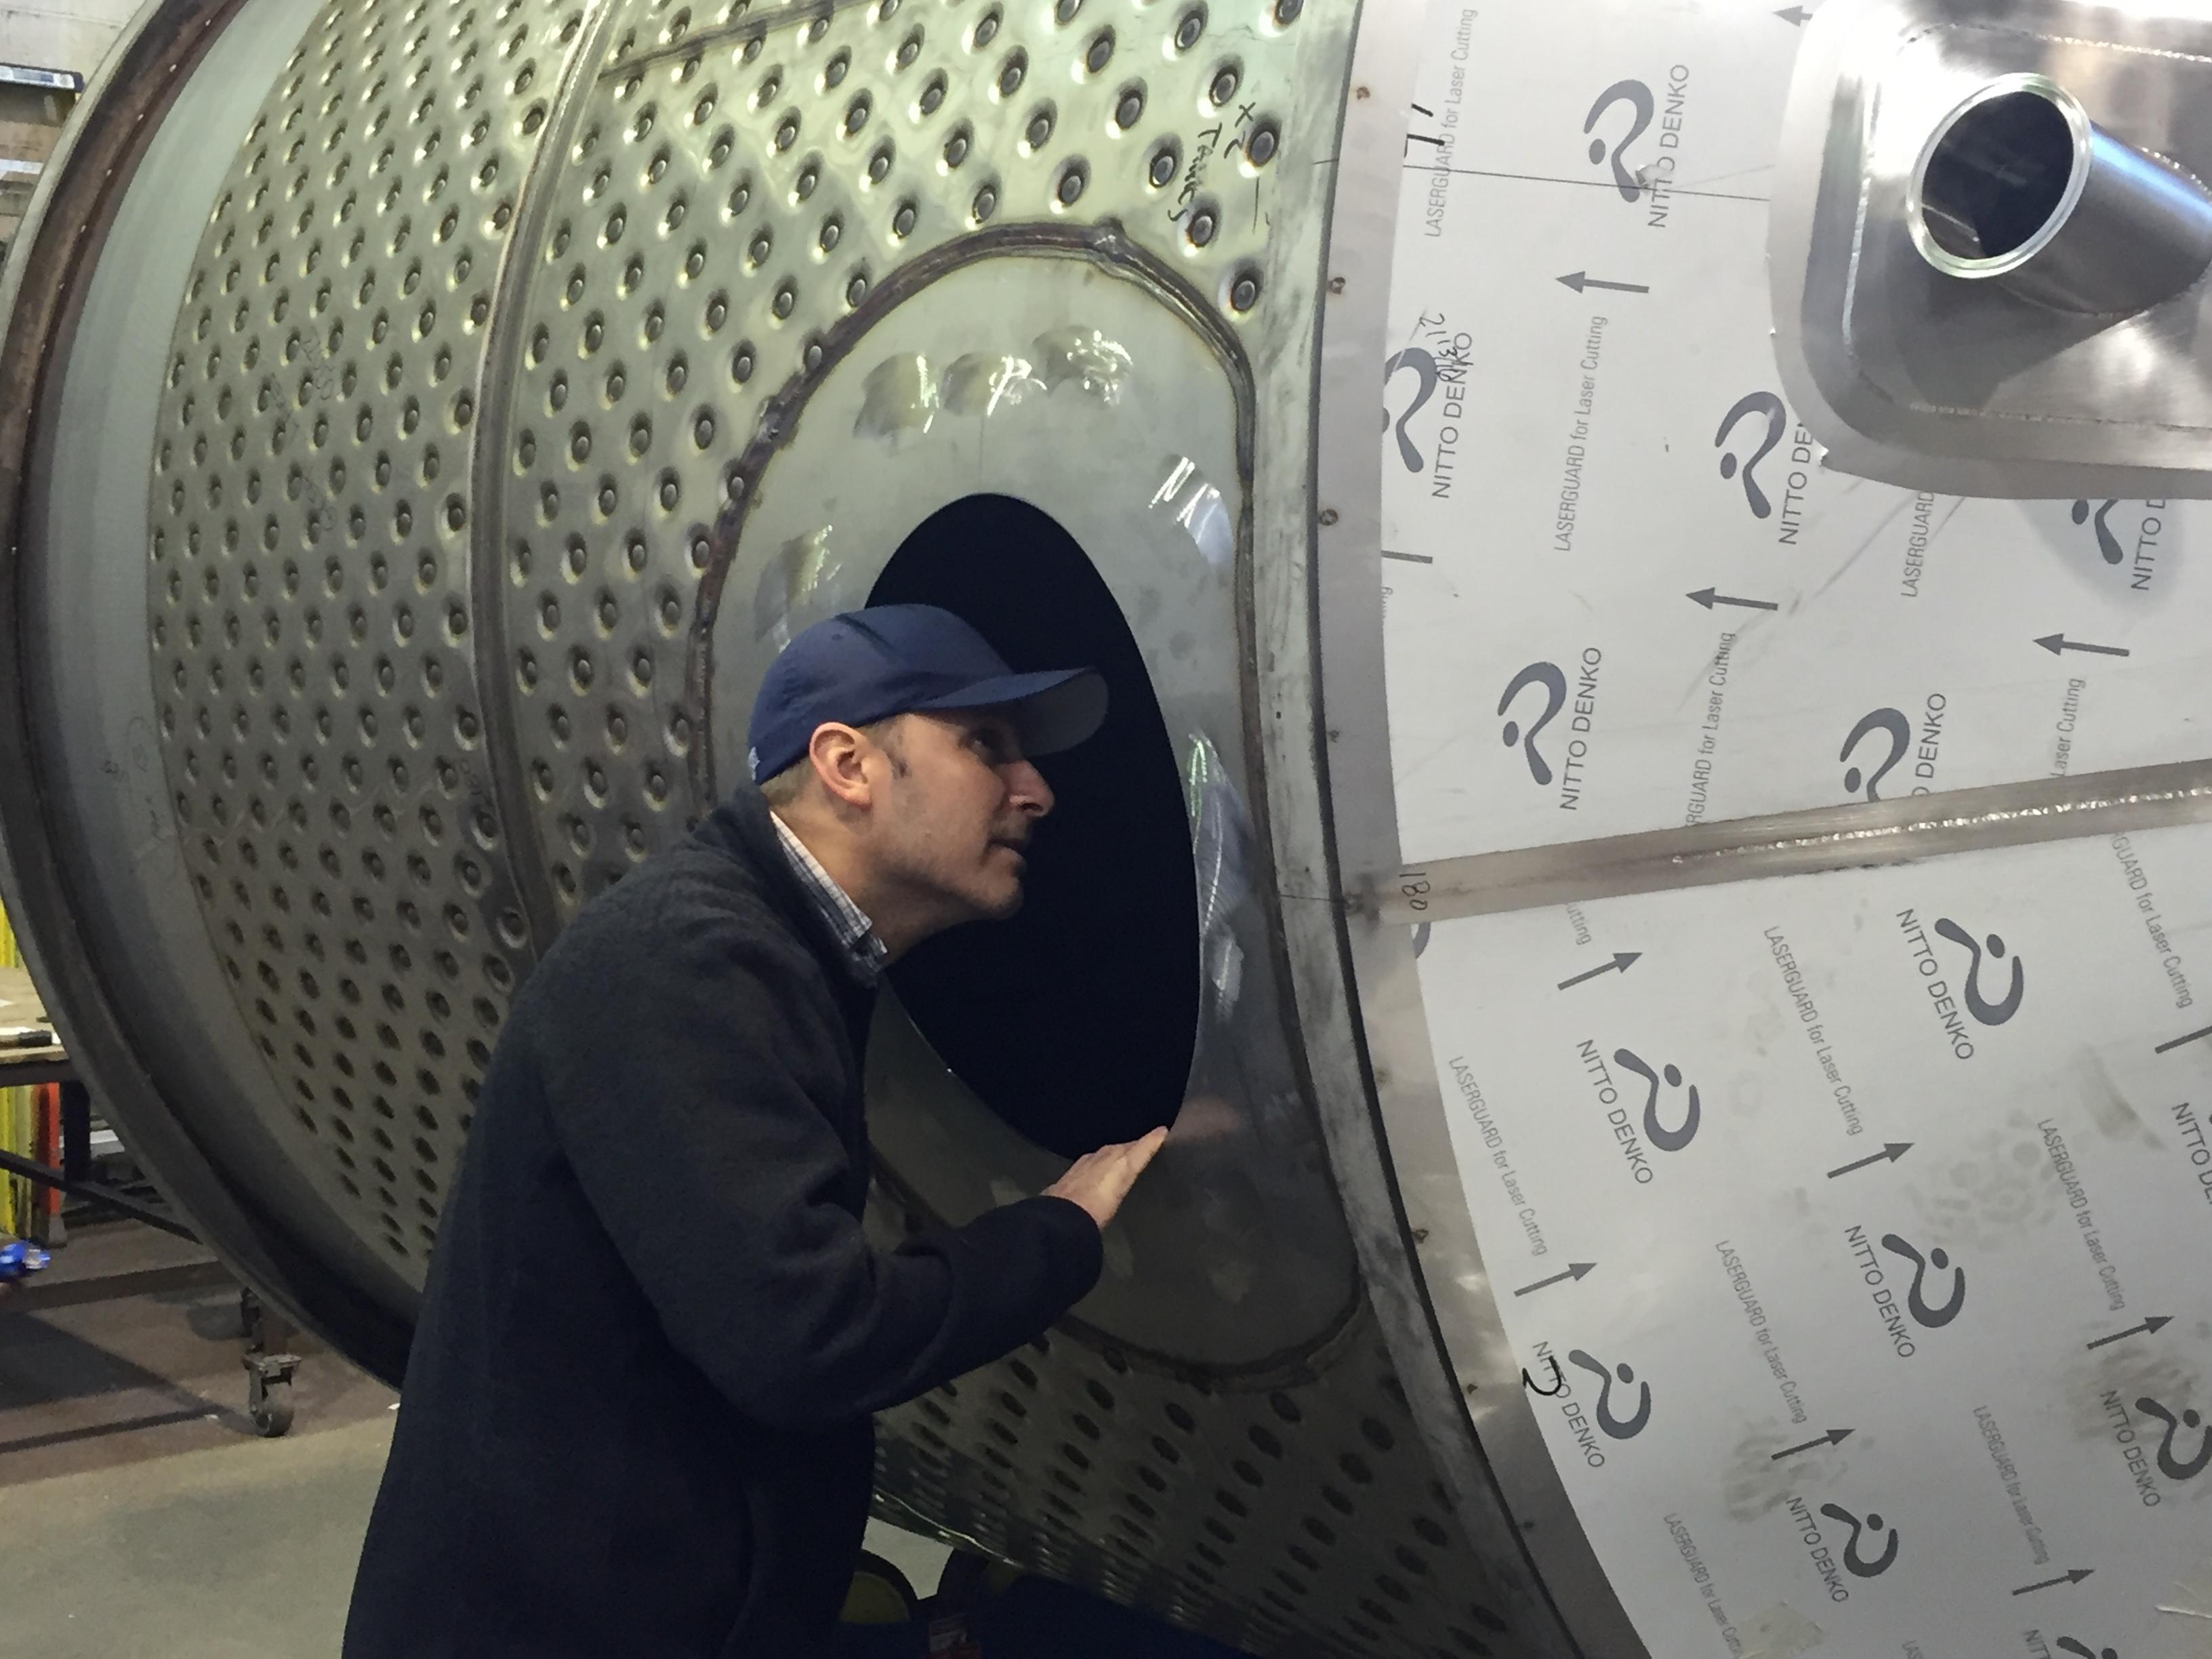 Peter inspecting tank